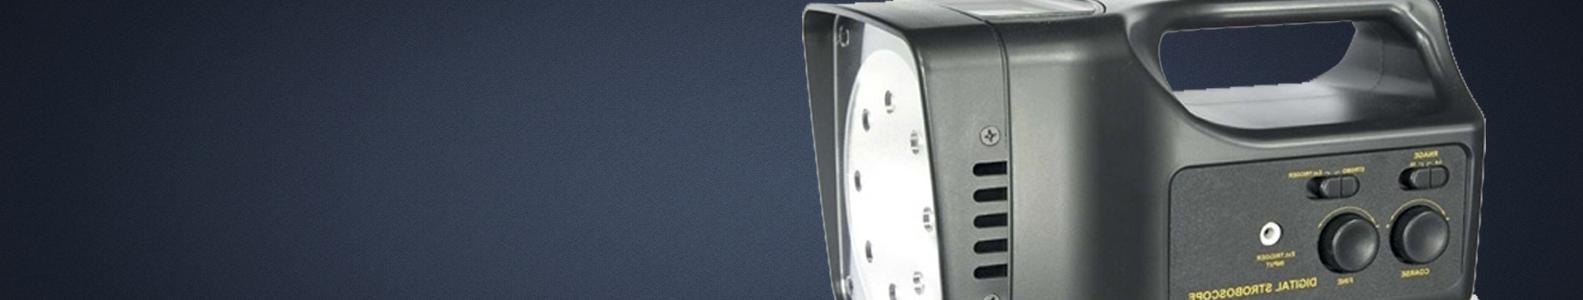 Stroboskopai  Stroboskopai ieškantiems  aukštos kokybės prietaisų